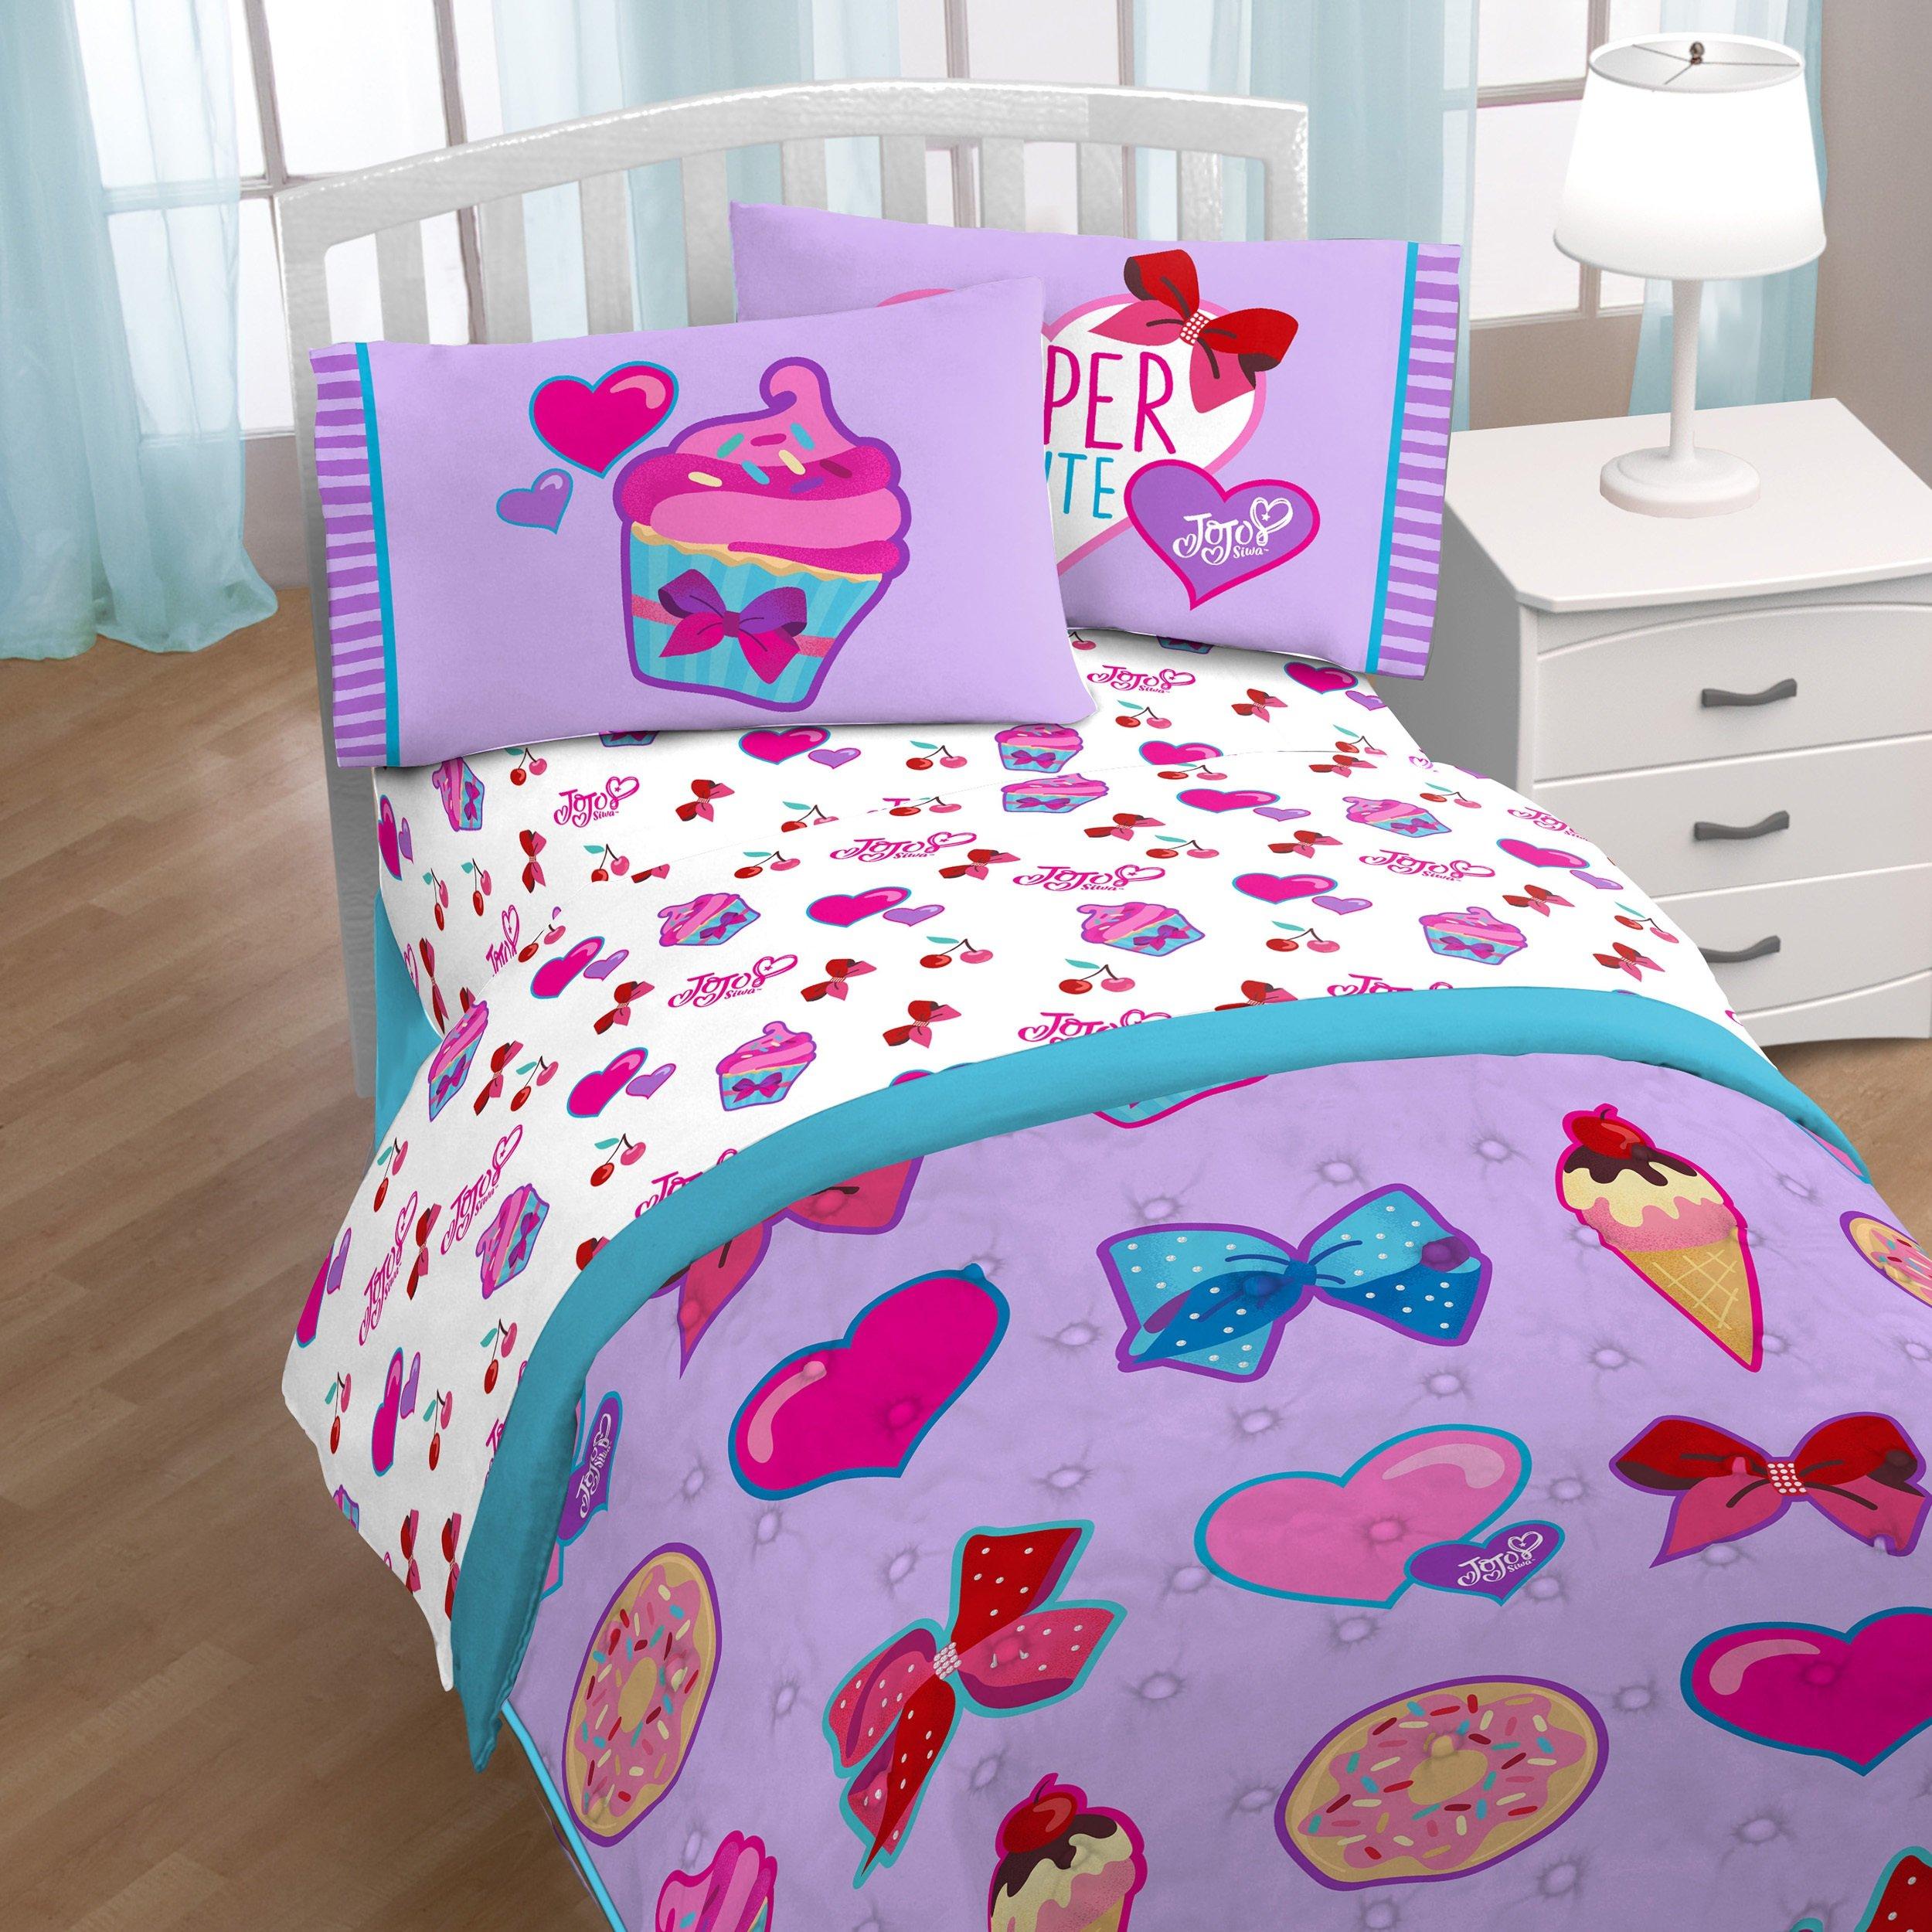 Nickelodeon JoJo Siwa Bowlicious 3 Piece Twin Sheet Set (Official JoJo Siwa Product)